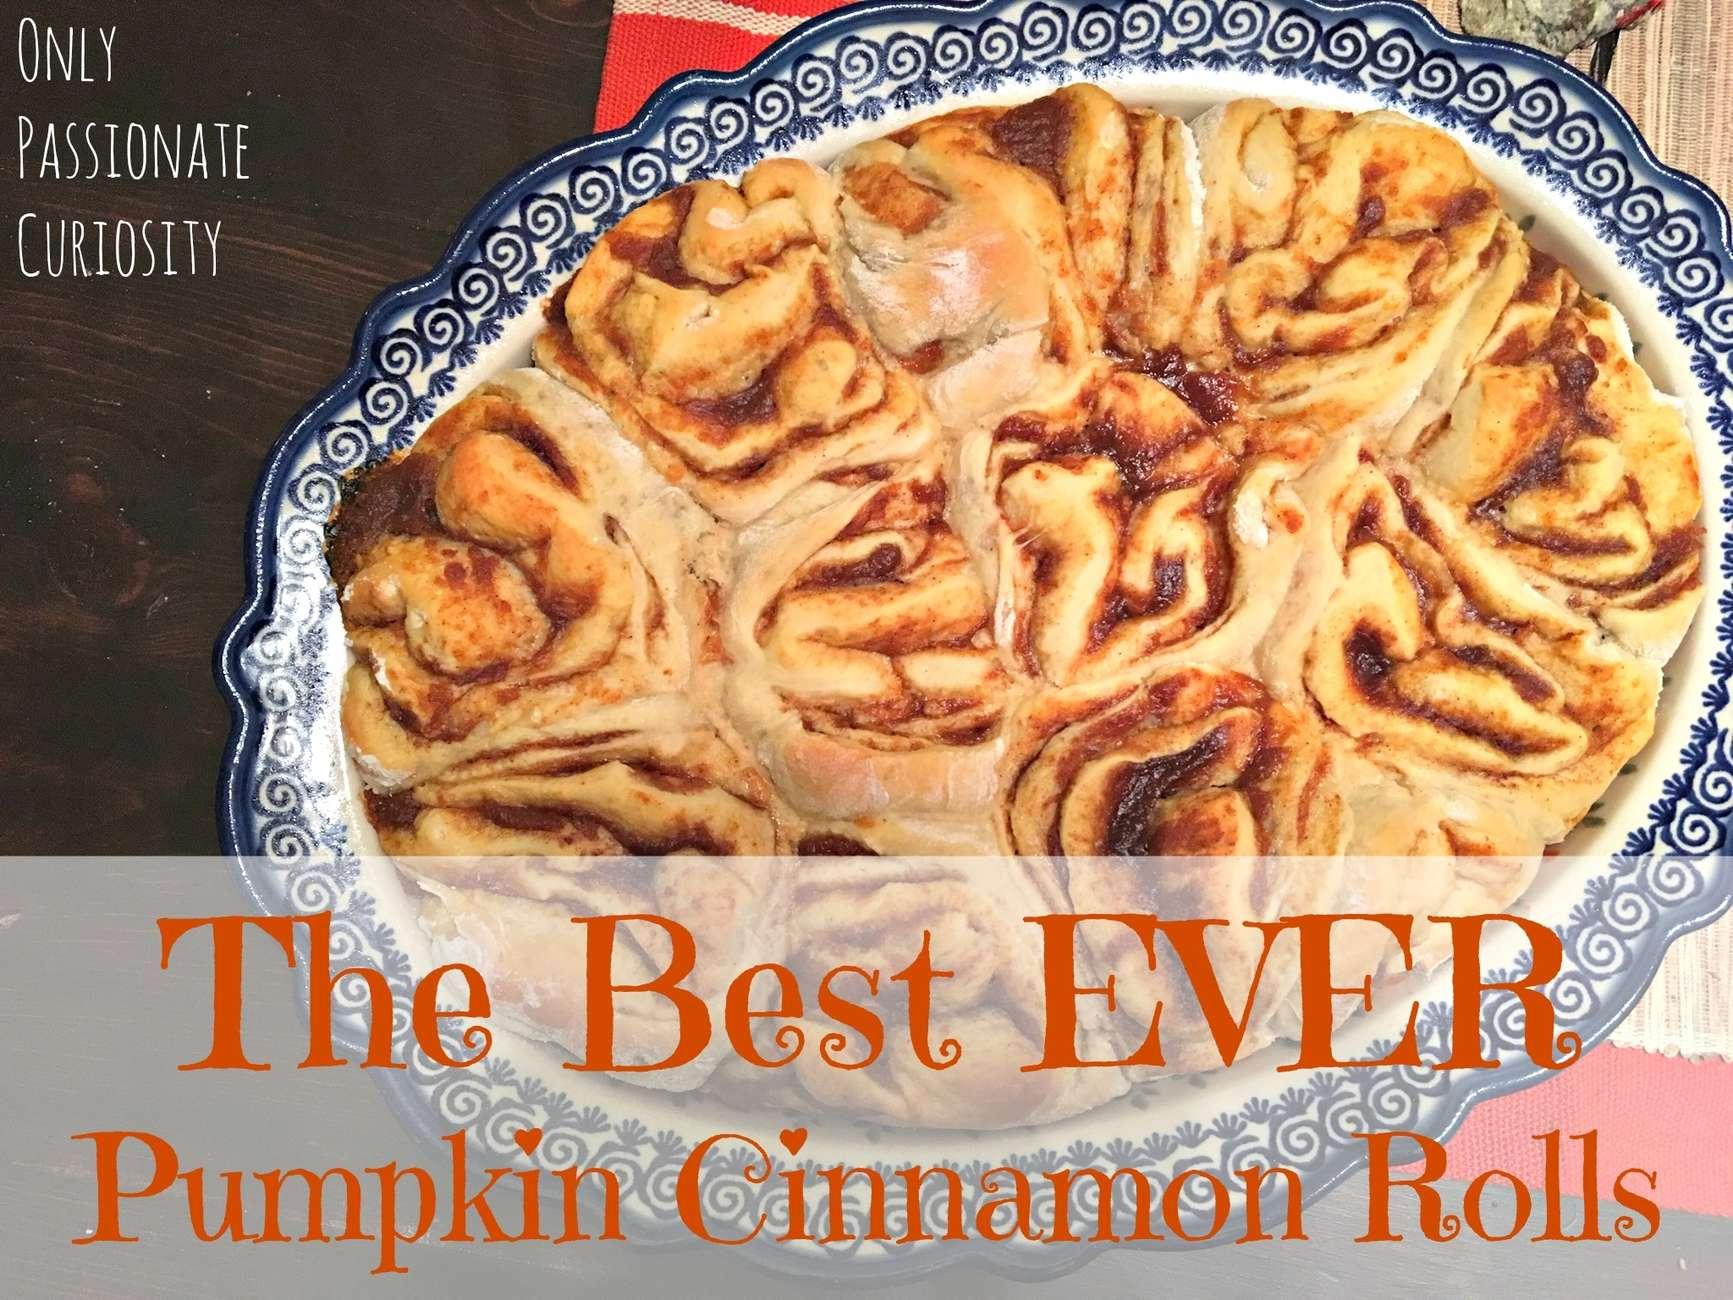 The World's Best Cinnamon Rolls